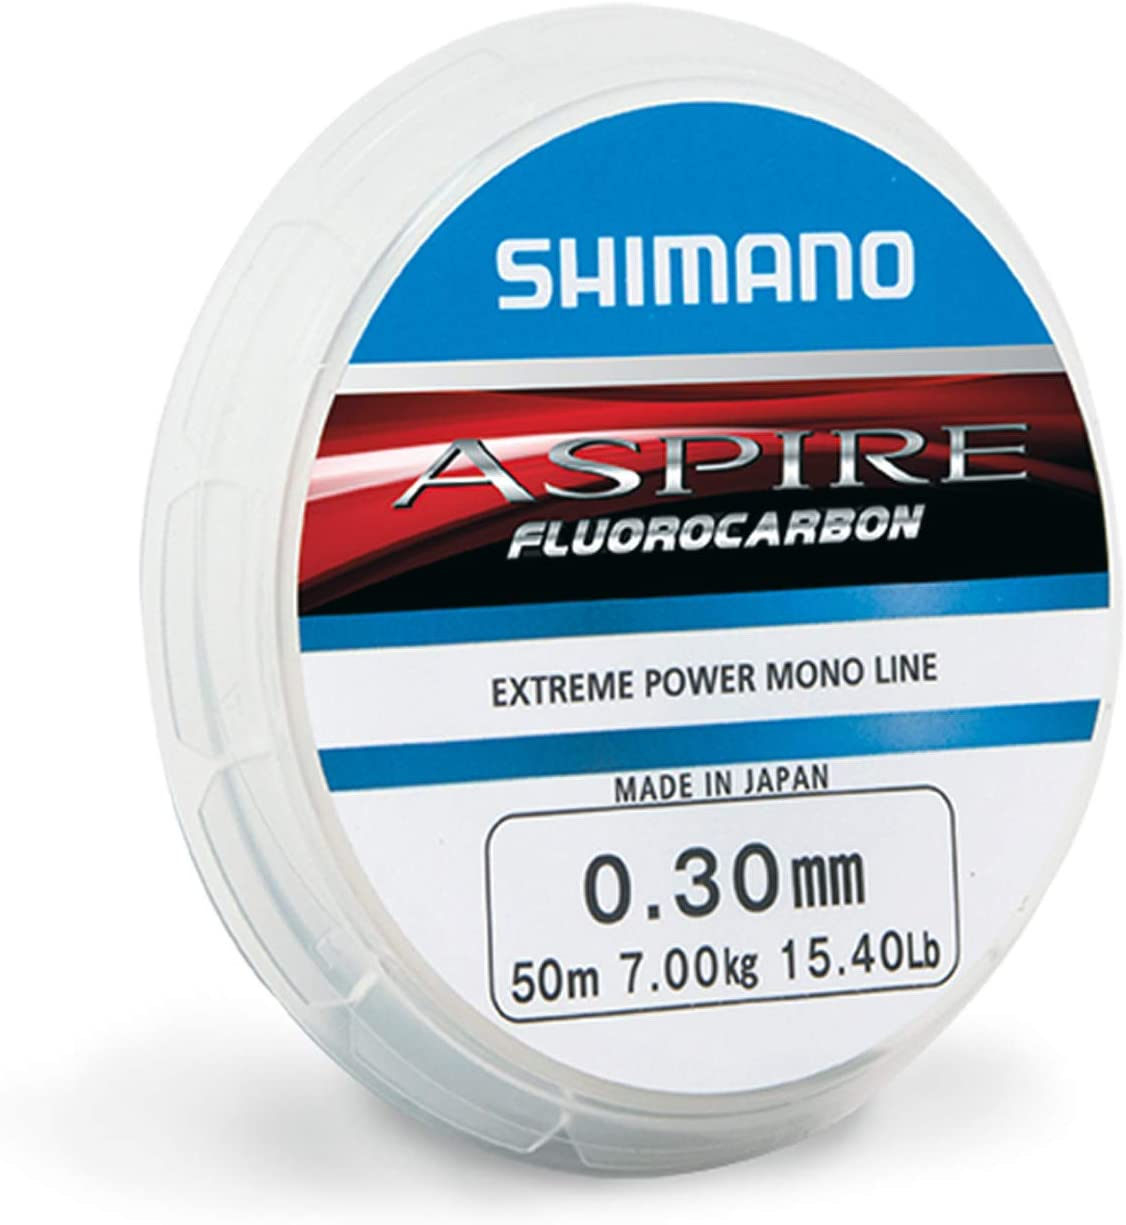 Shimano Aspire fluorocarbon 50/m